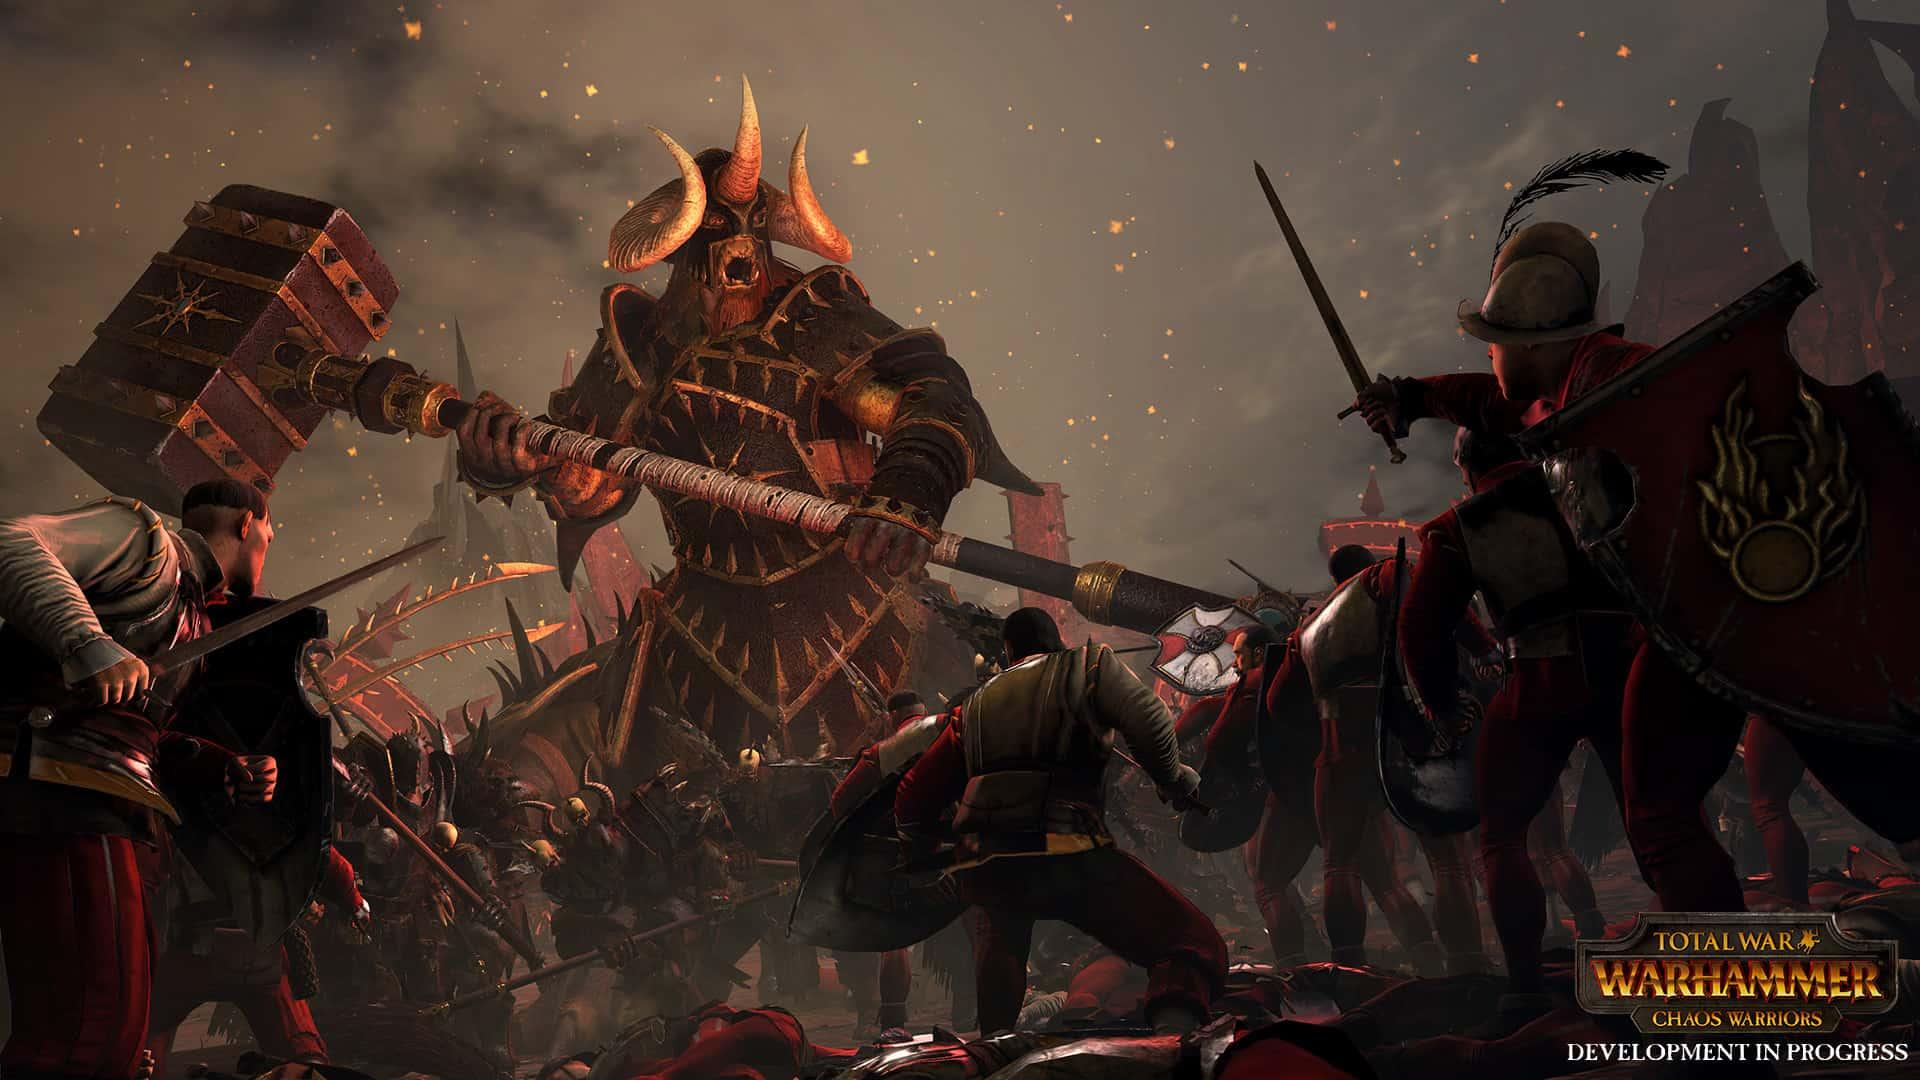 Total War Warhammer Guerrieri del Caos cover